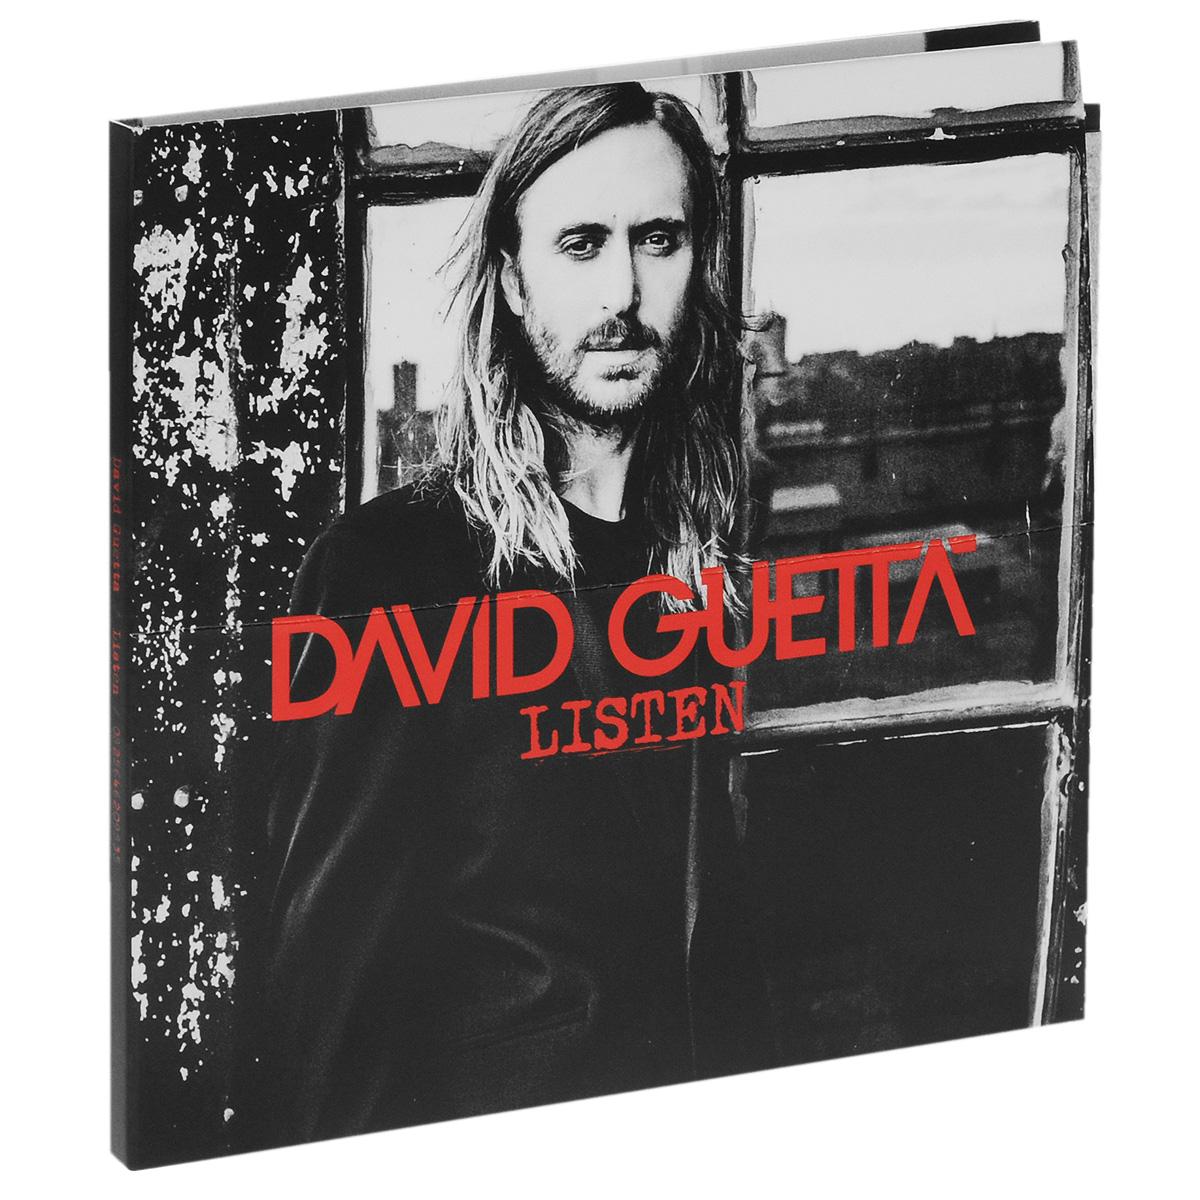 Дэвид Гетта David Guetta. Listen. Limited Edition (2 CD) david pogue classical music for dummies